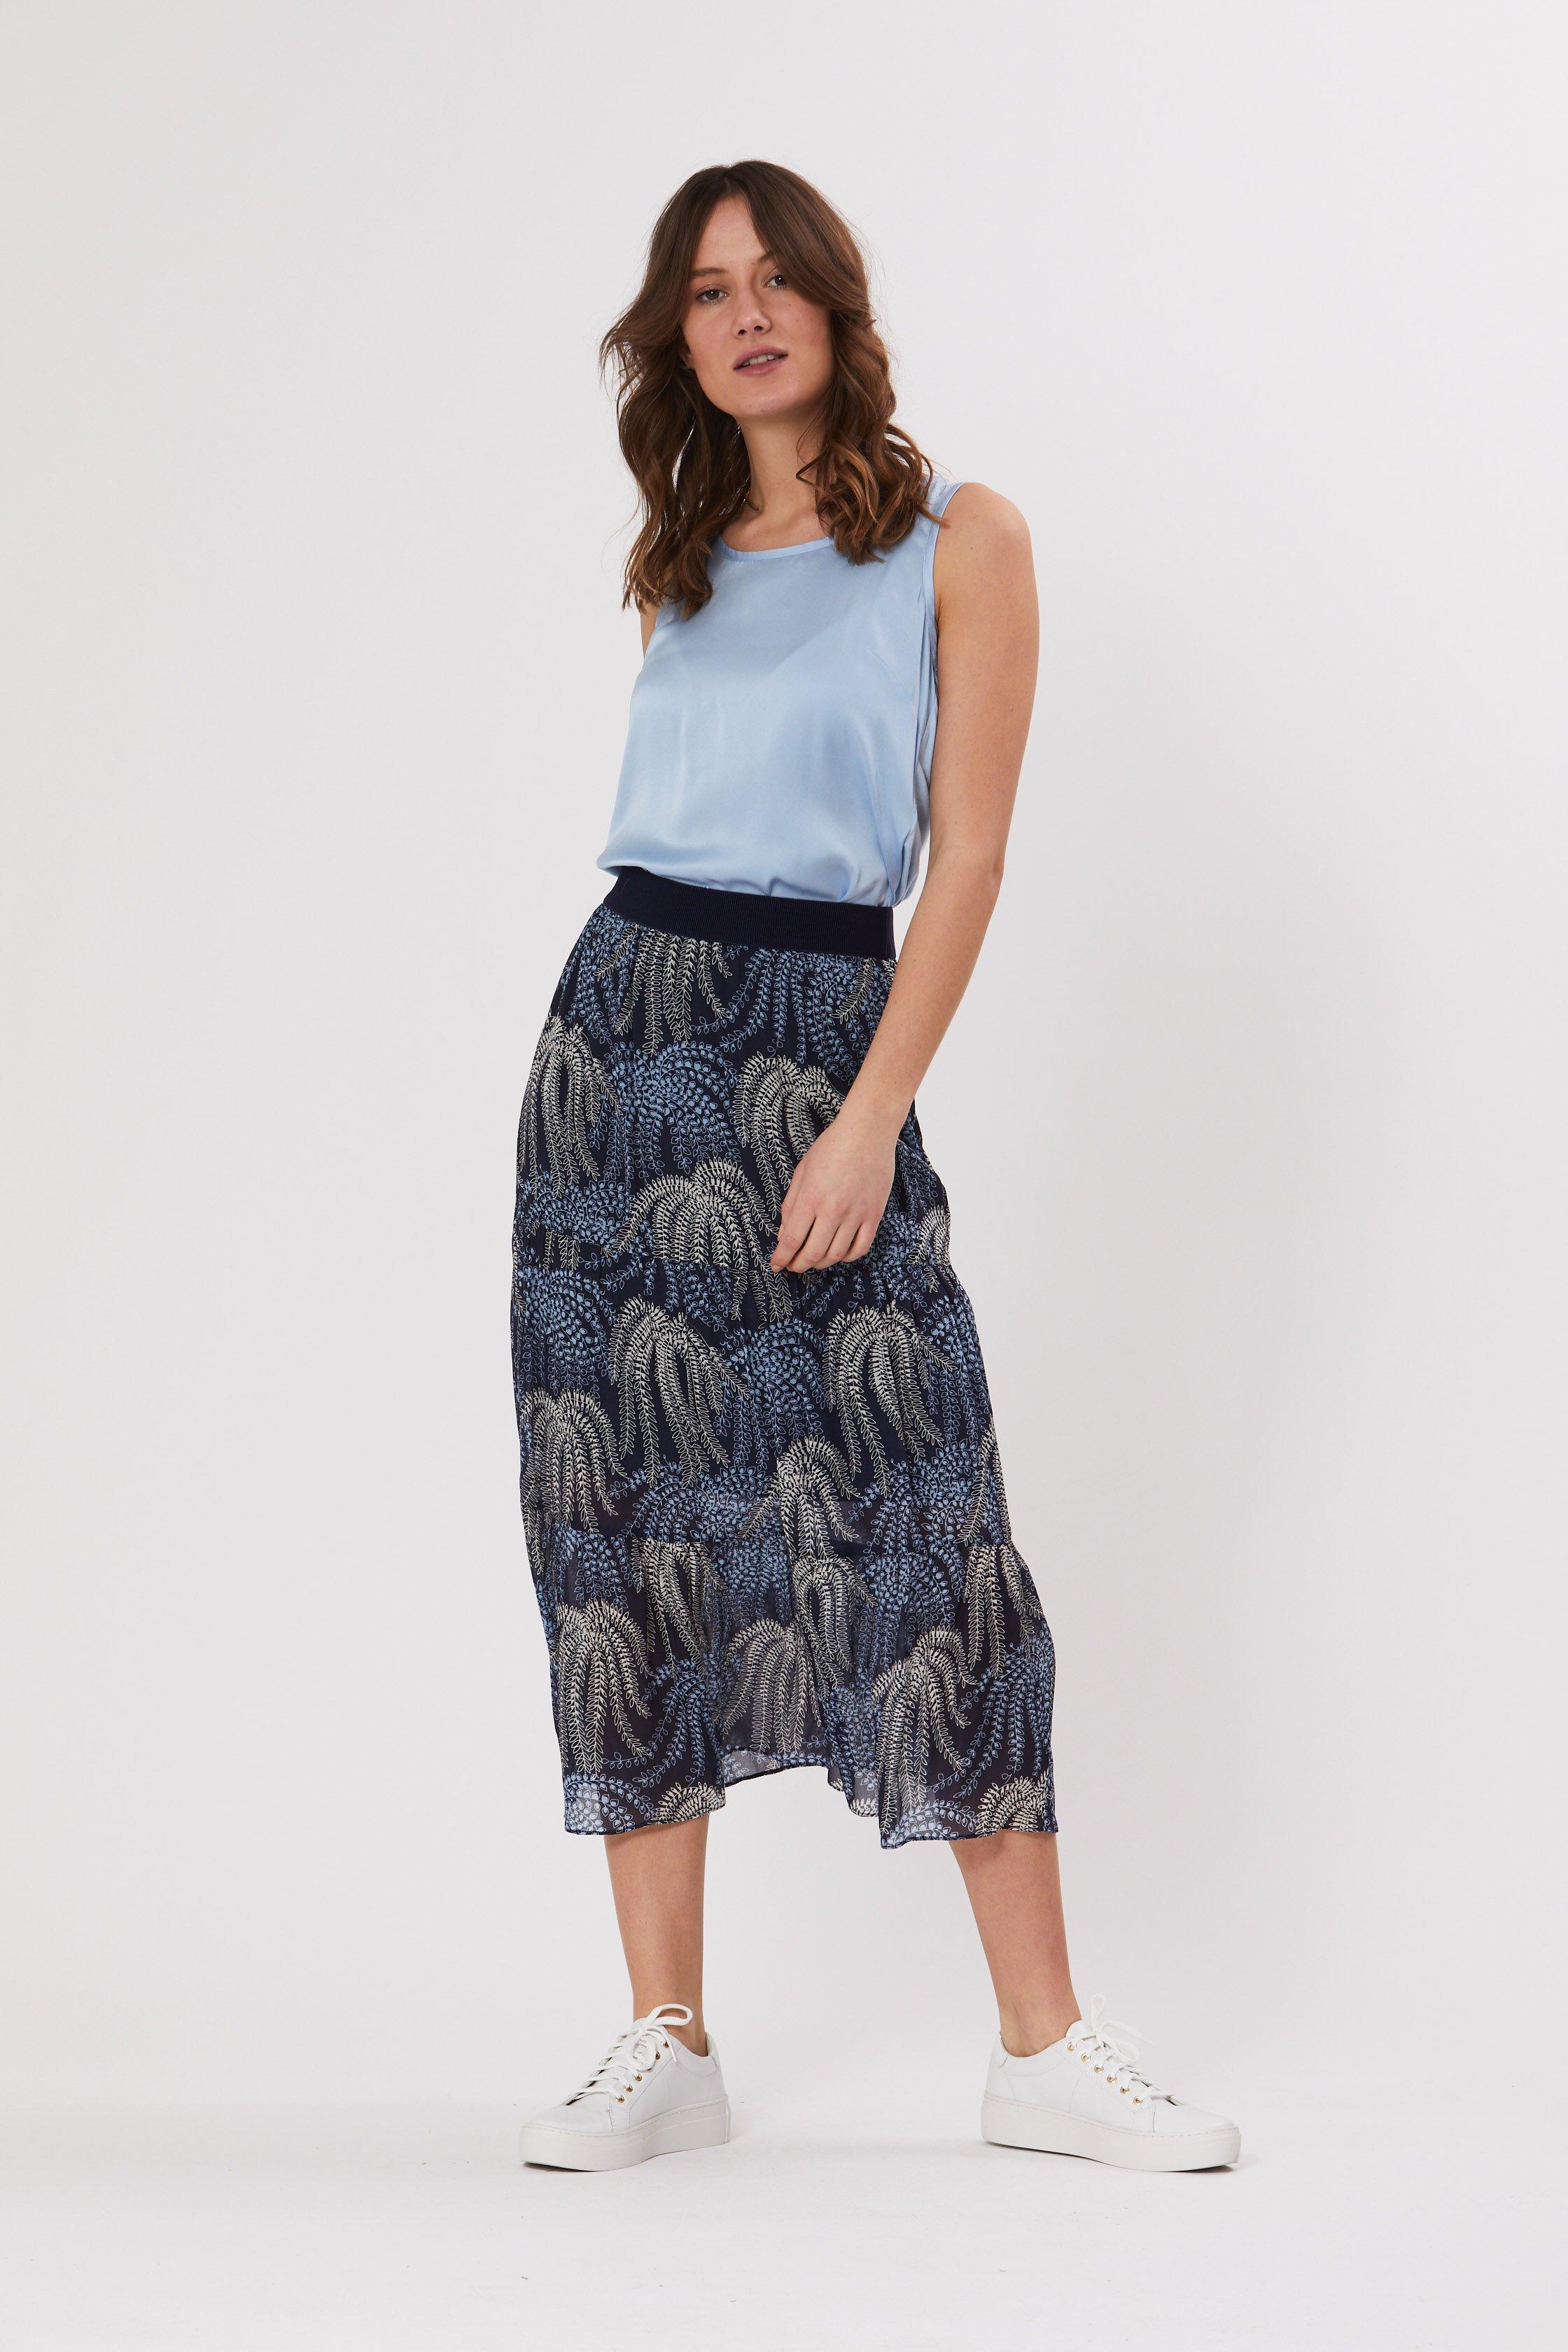 PBO Zeus nederdel, blue multi color, 38